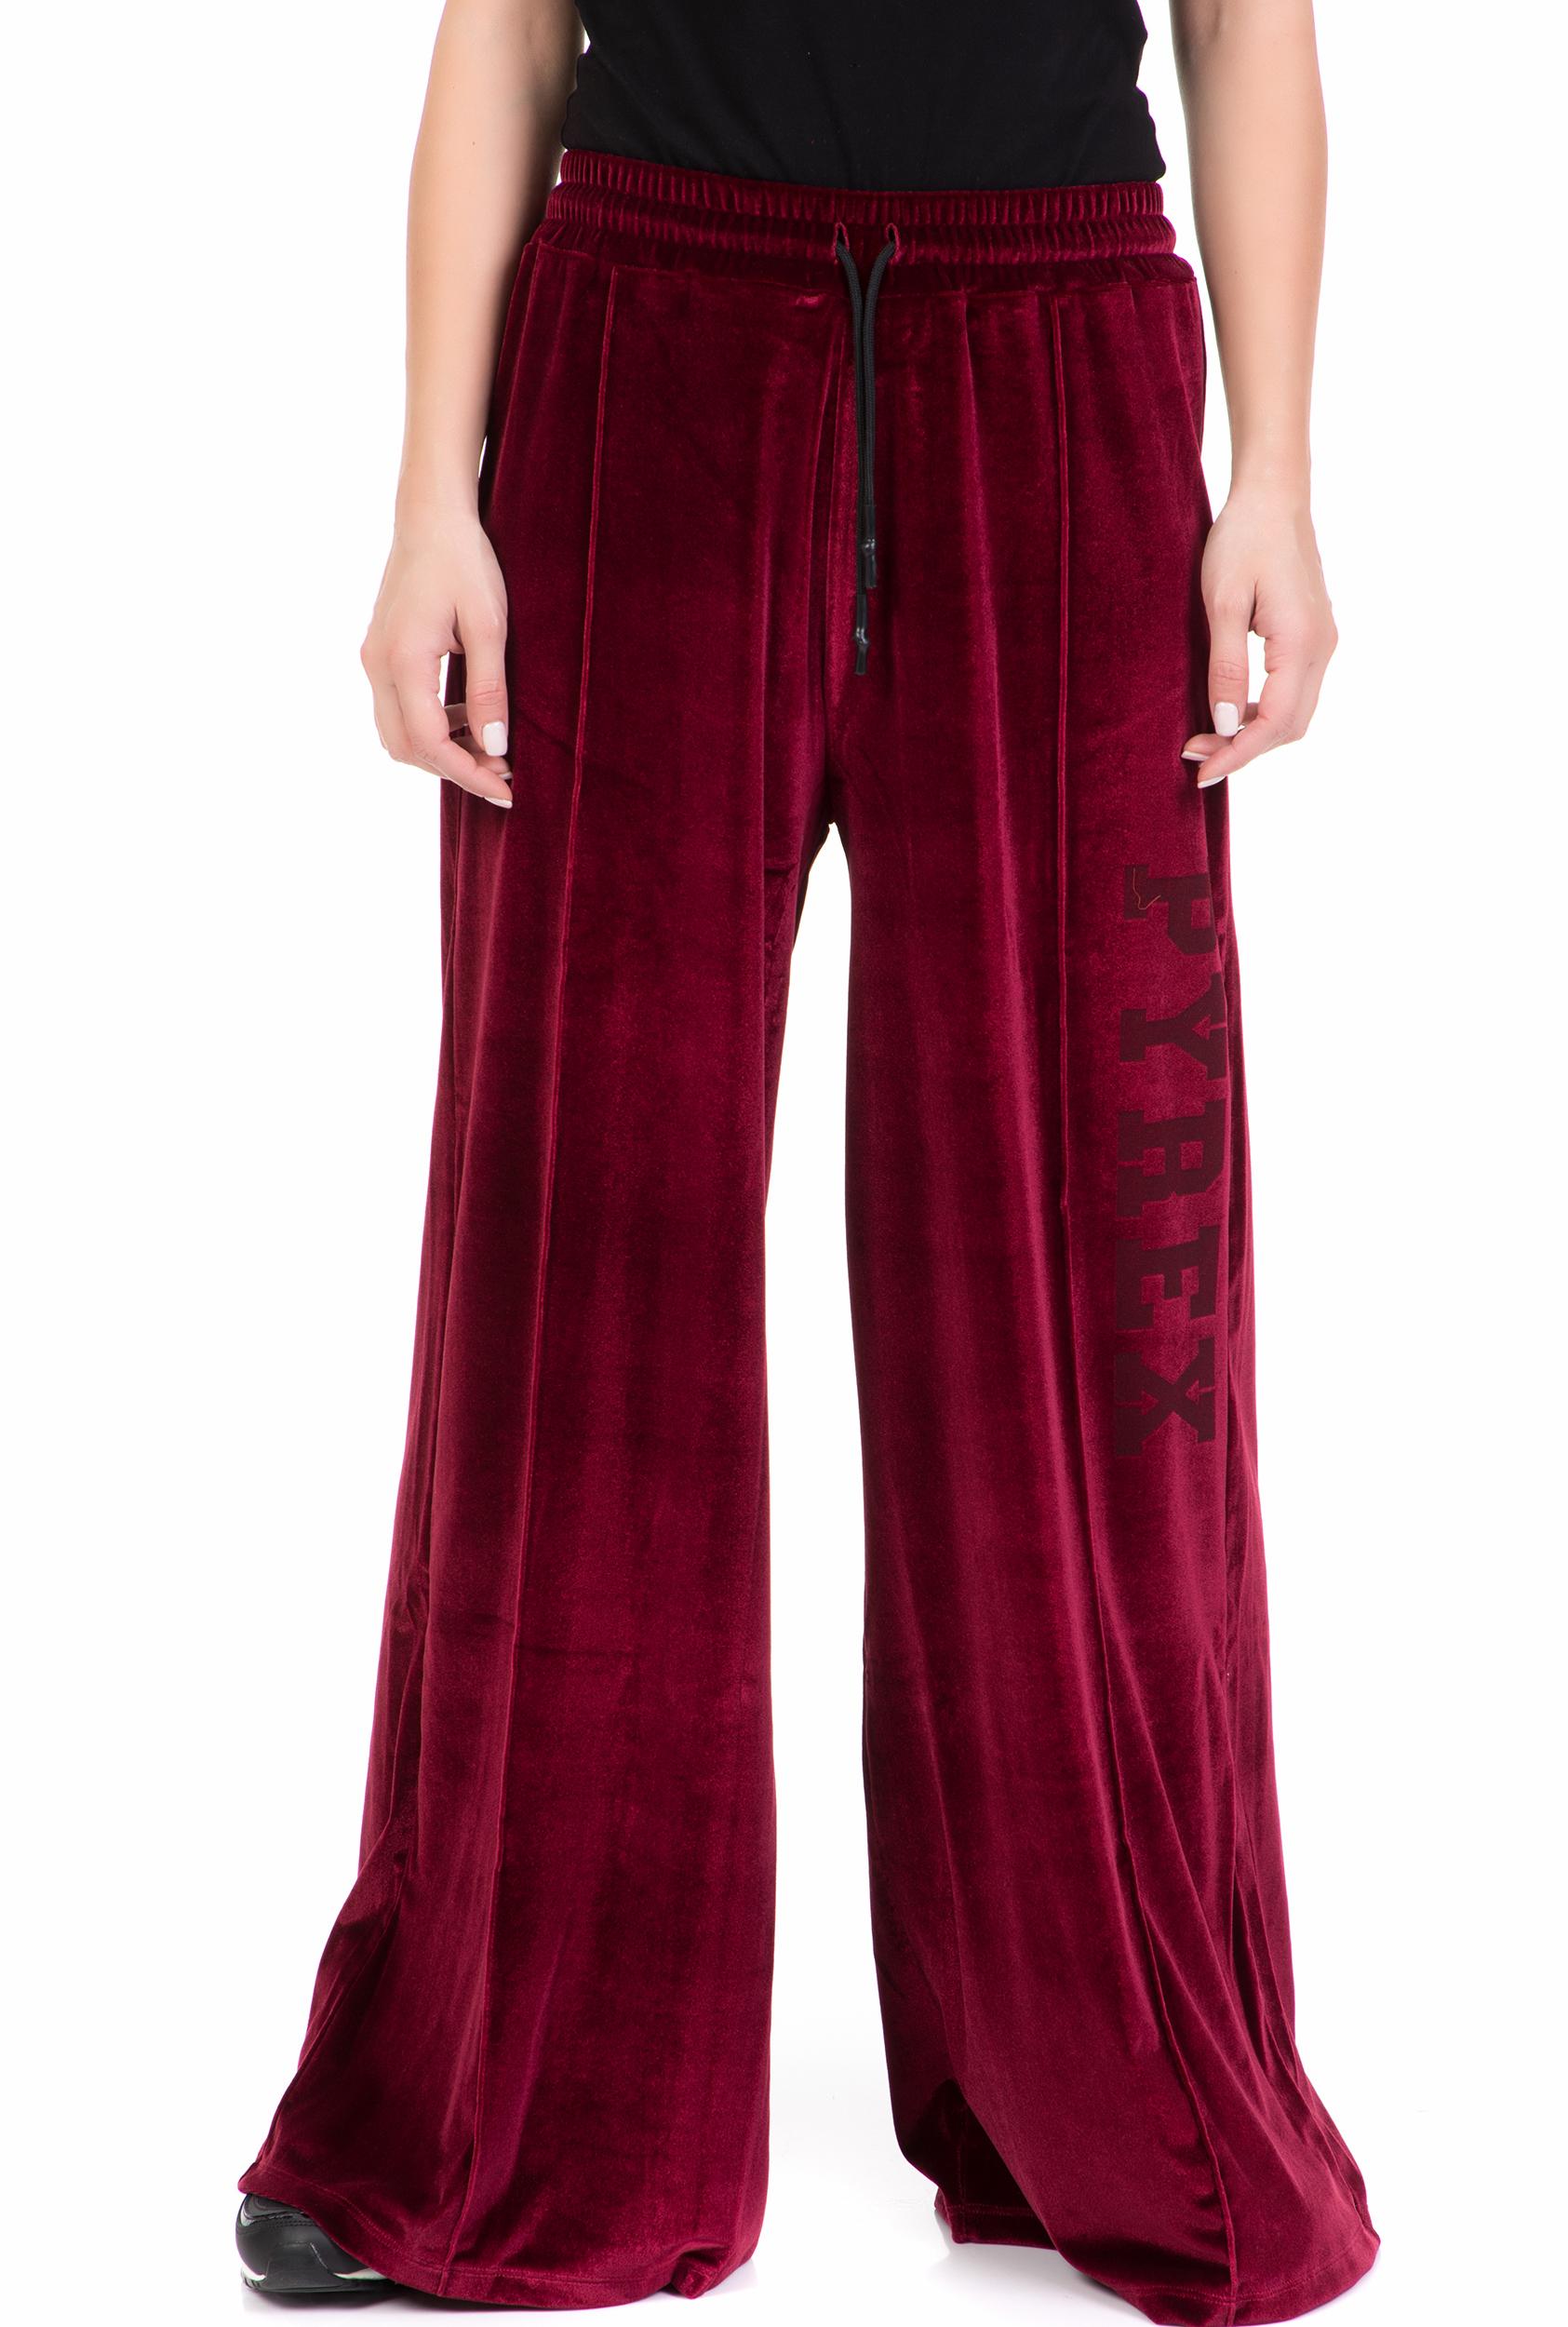 PYREX - Γυναικείο παντελόνι PYREX μπορντό